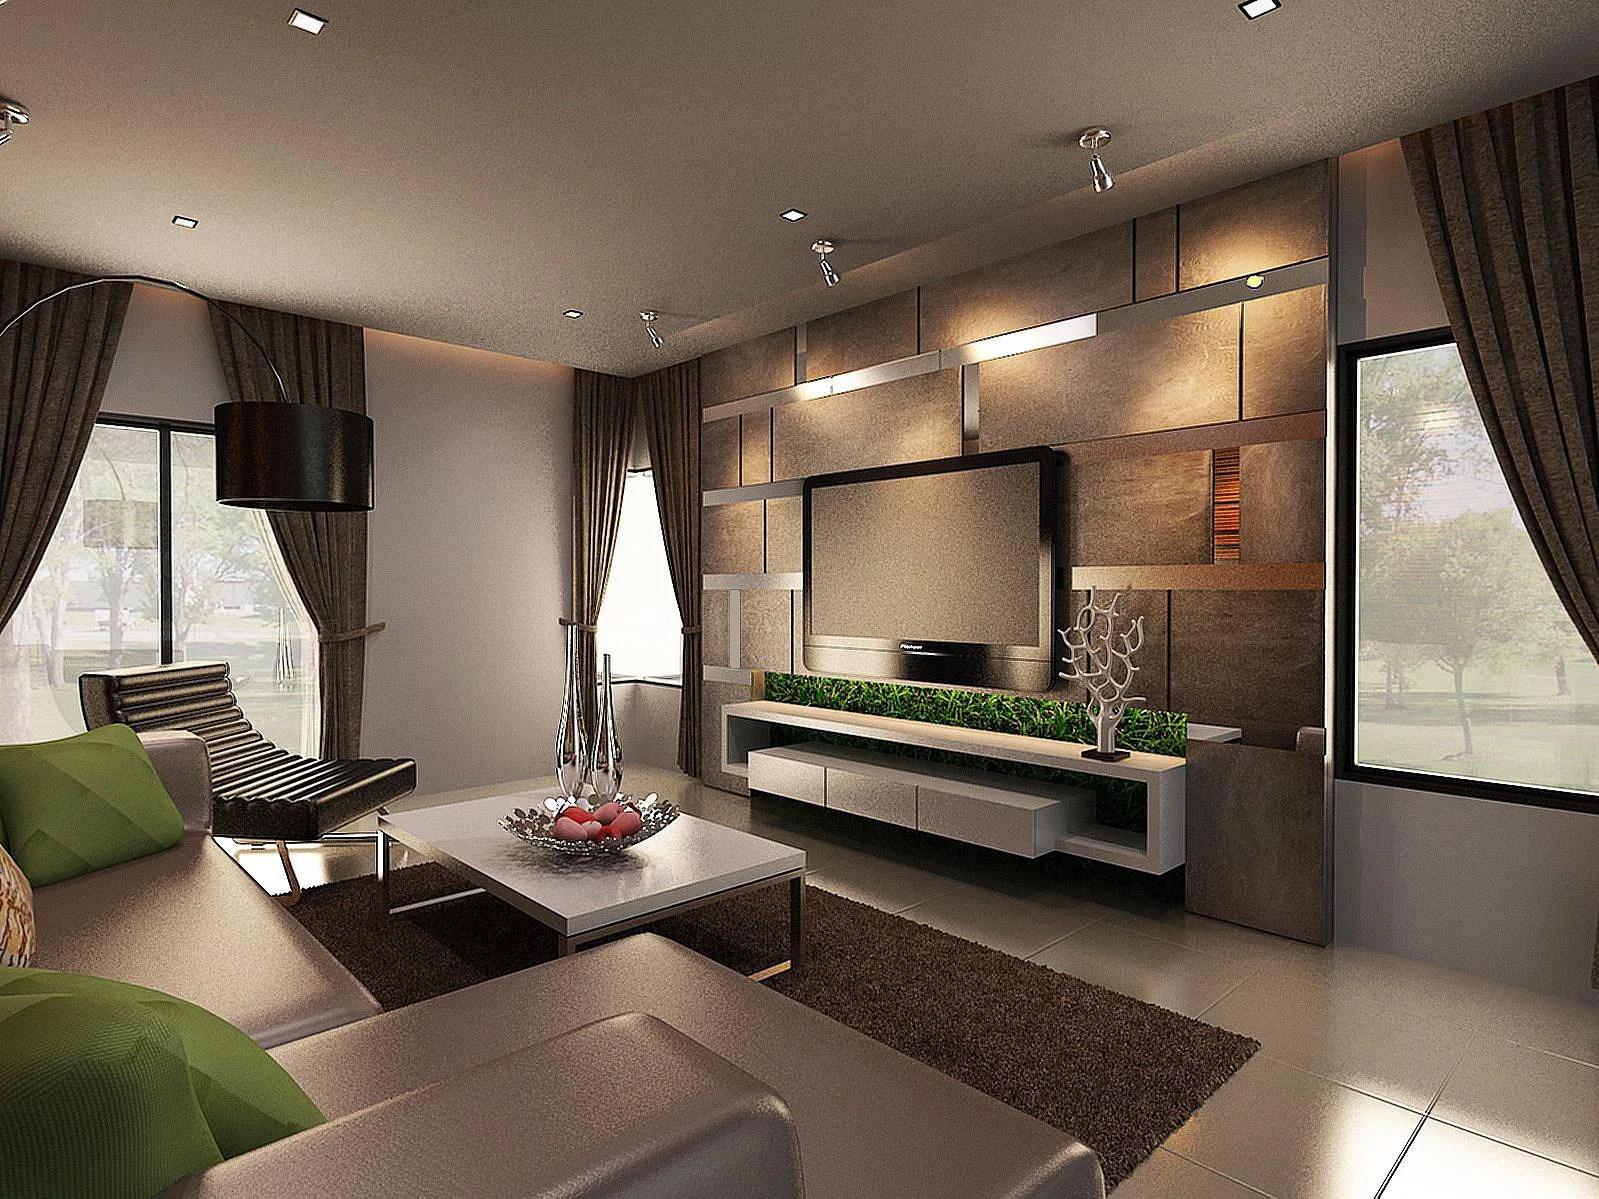 Lavish Interior Design - Hdb Bto Dbss